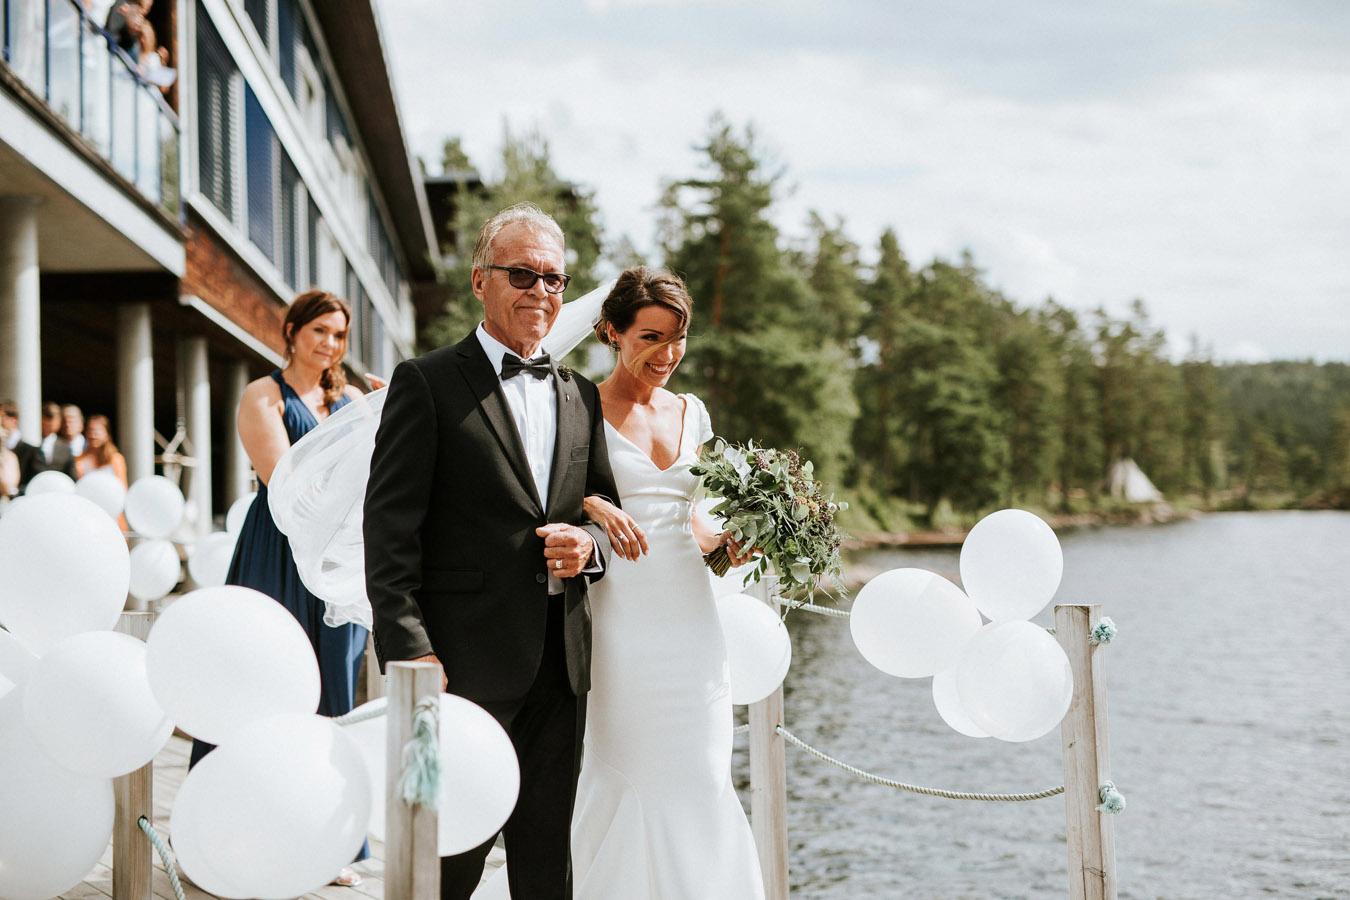 Fotograf-Tone-Tvedt-bryllup-212.jpg